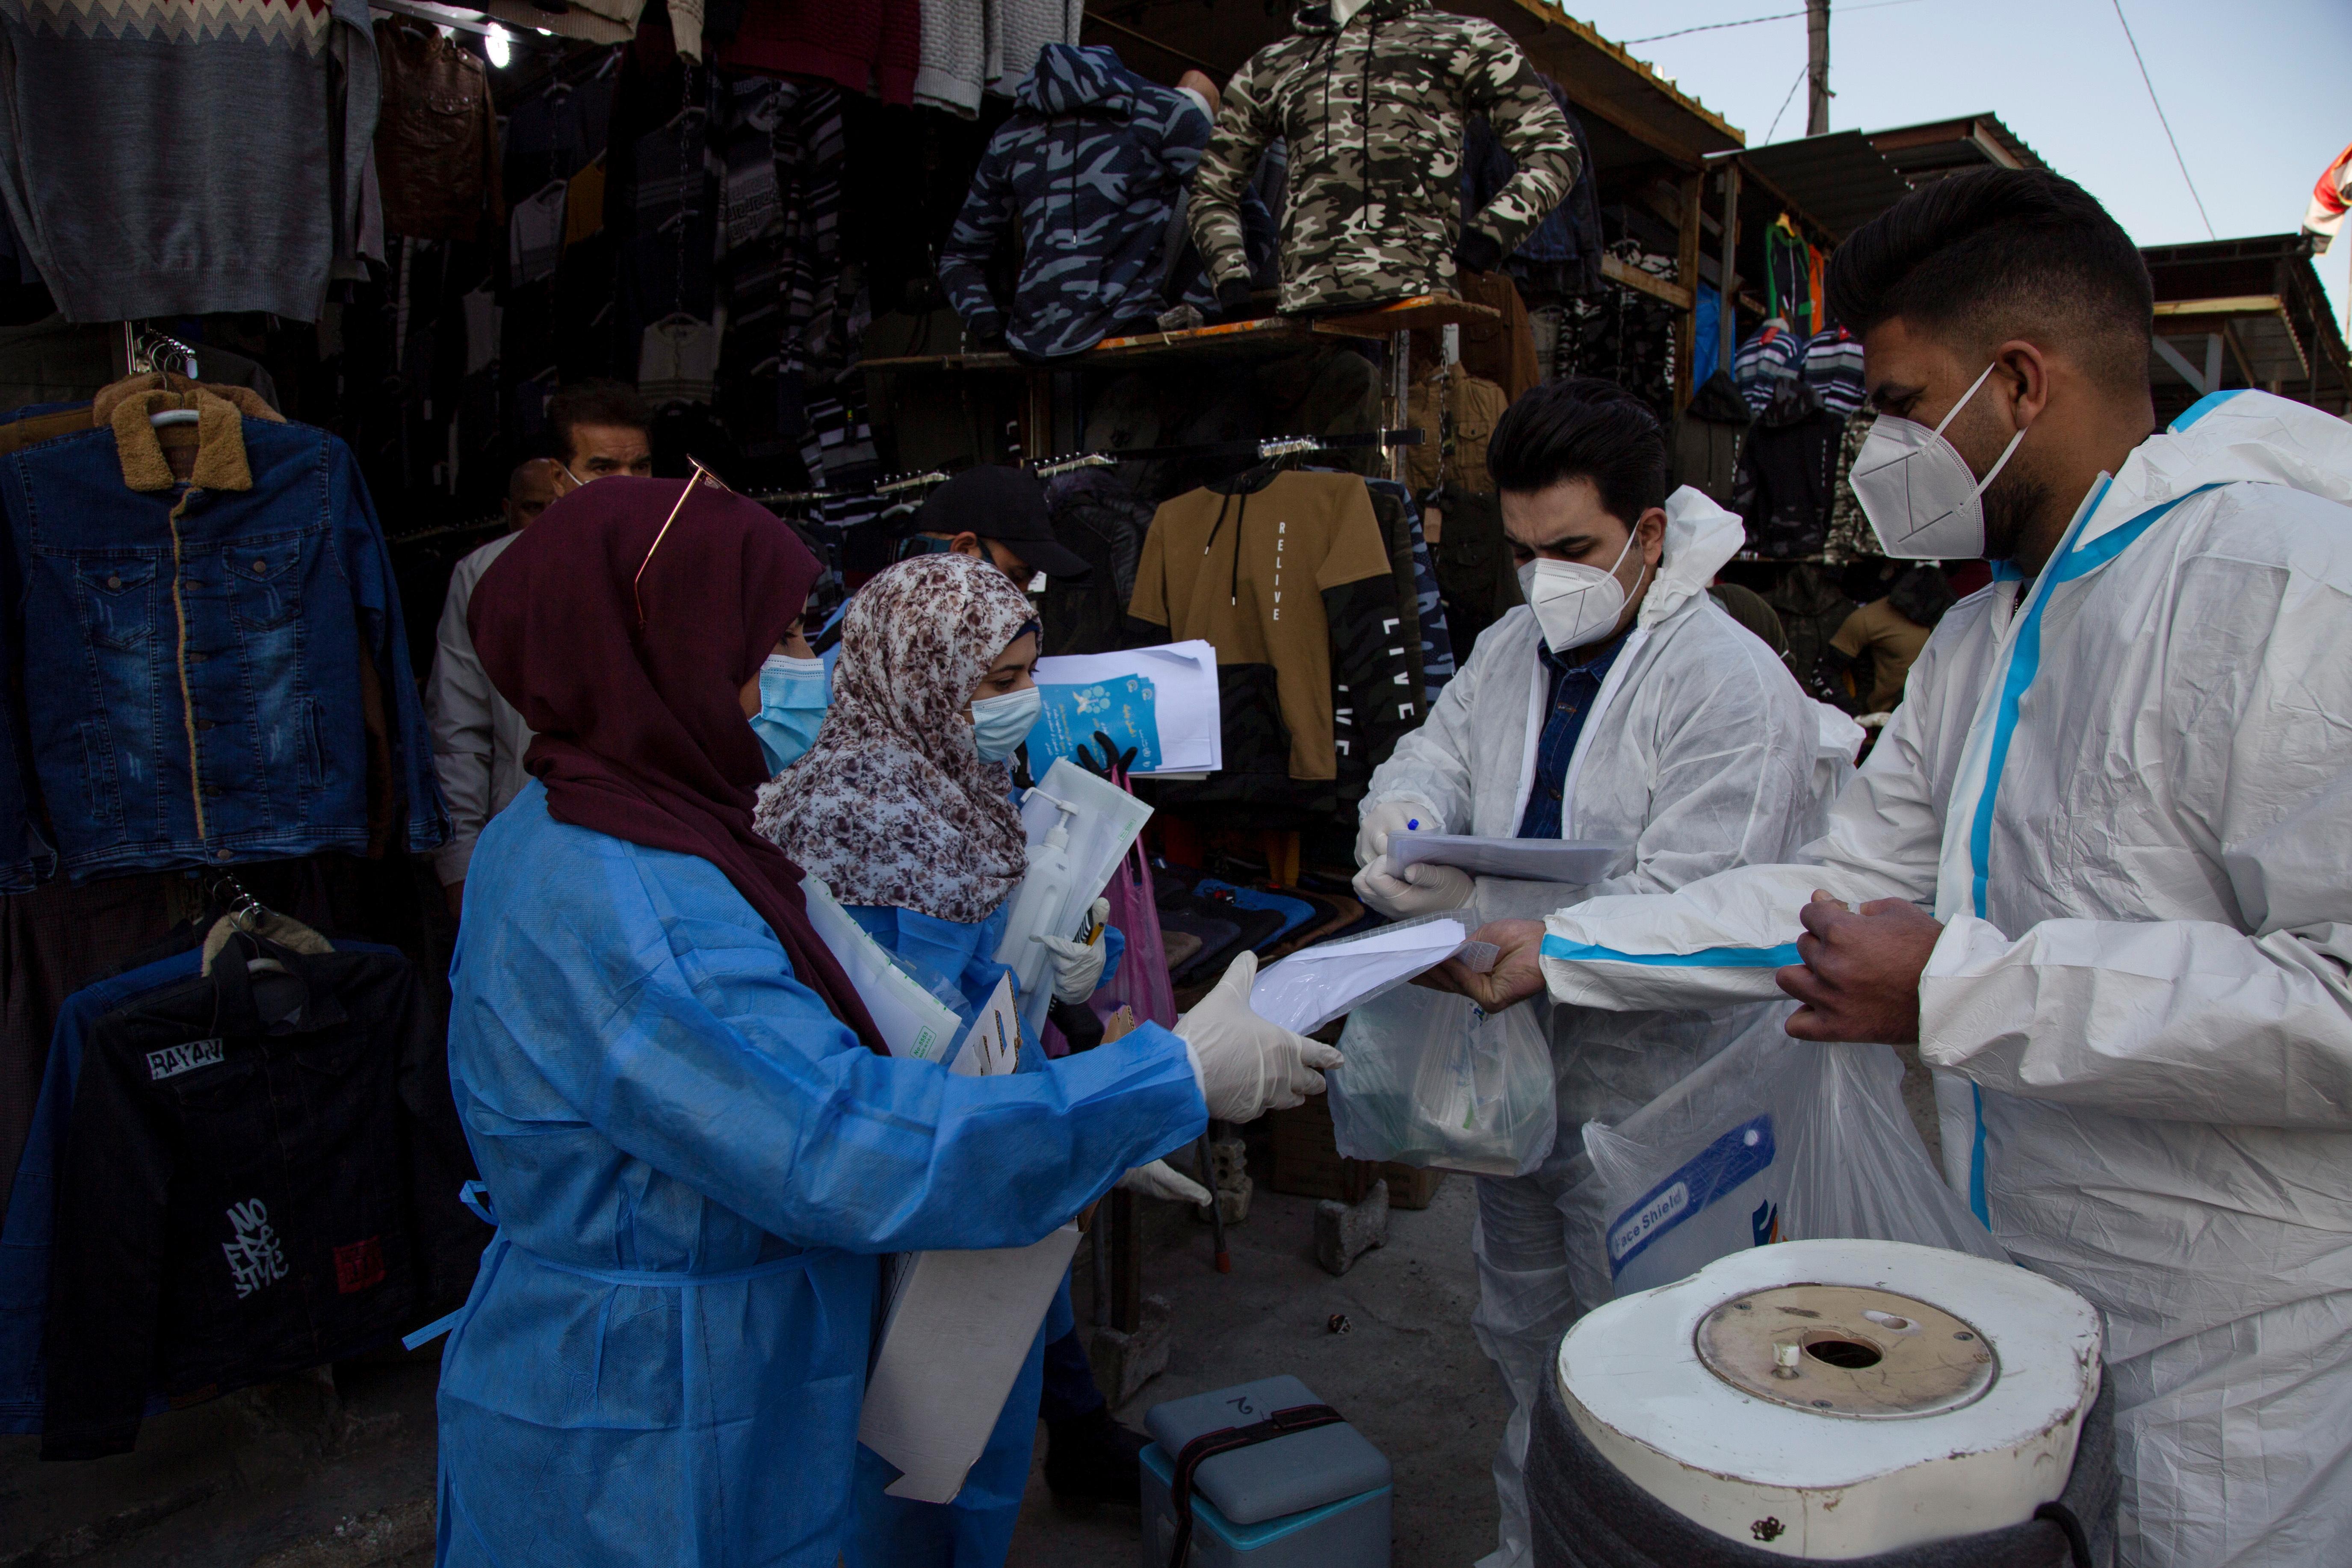 Members of medical team that work with mobile coronavirus disease (COVID-19) testing units prepare to take swabs from people in…